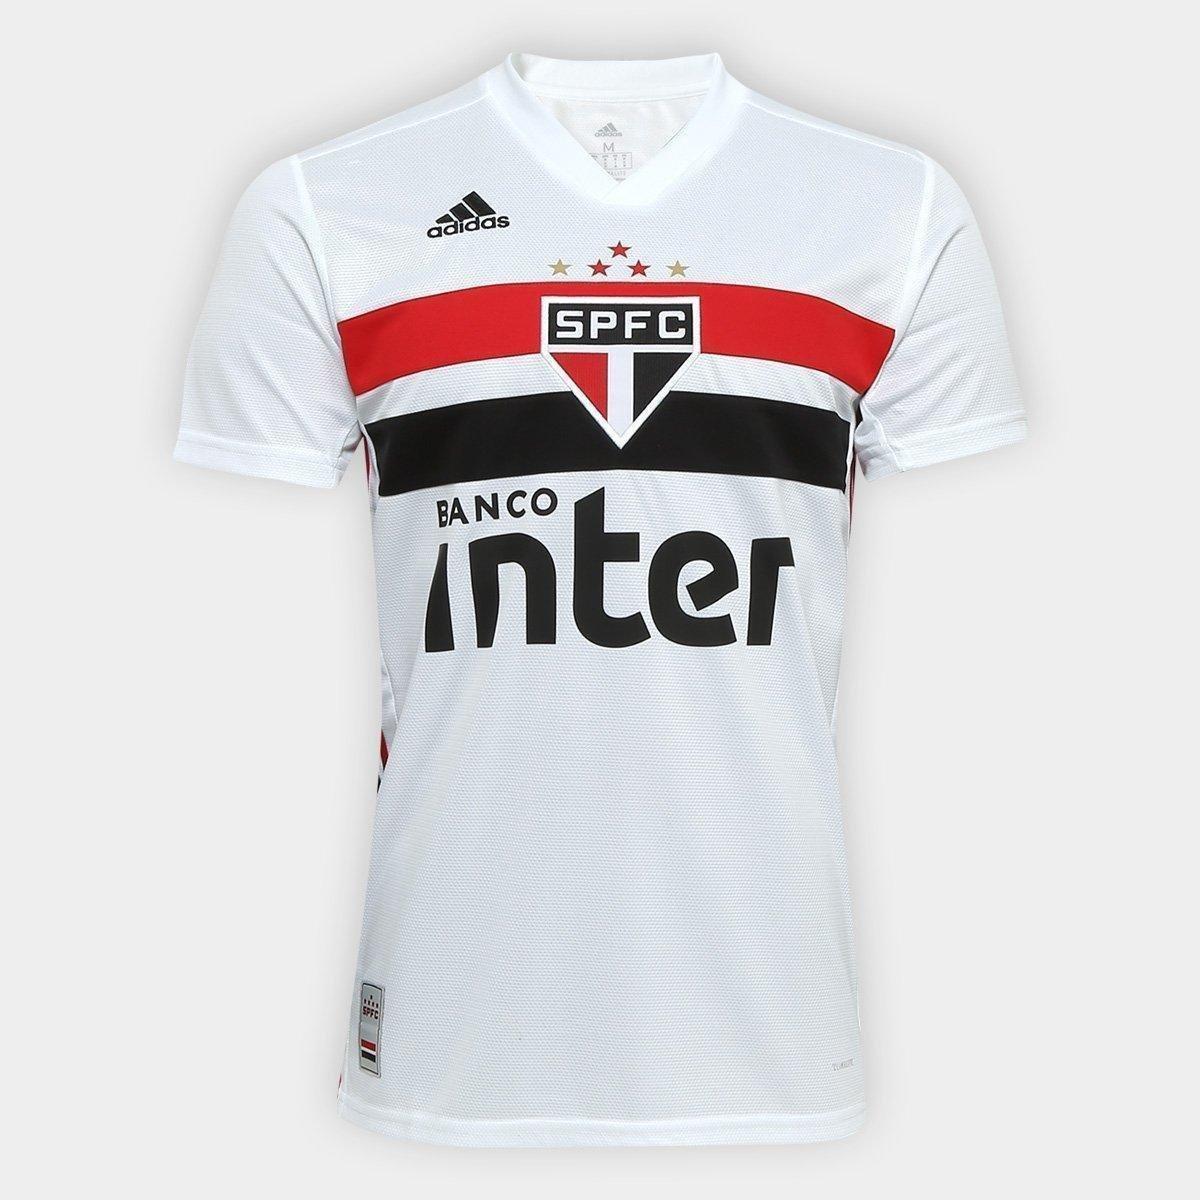 8414fb3980 Camisa São Paulo I 19/20 s/n° Torcedor Adidas Masculina